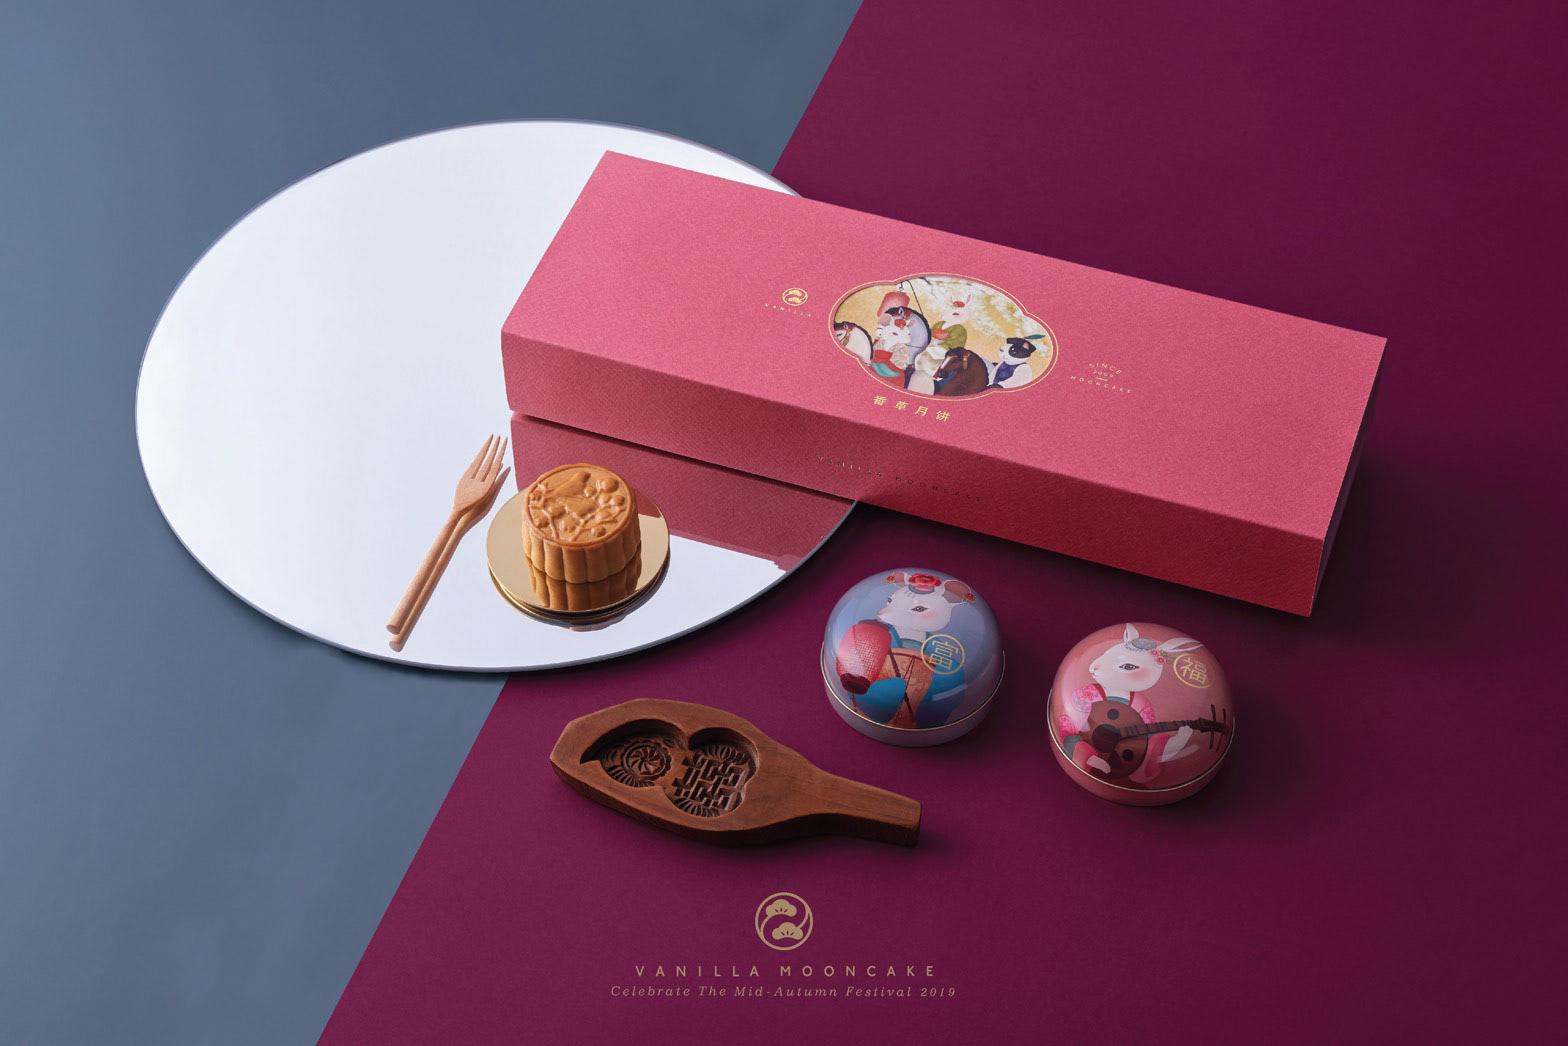 VANILLA 月饼包装14